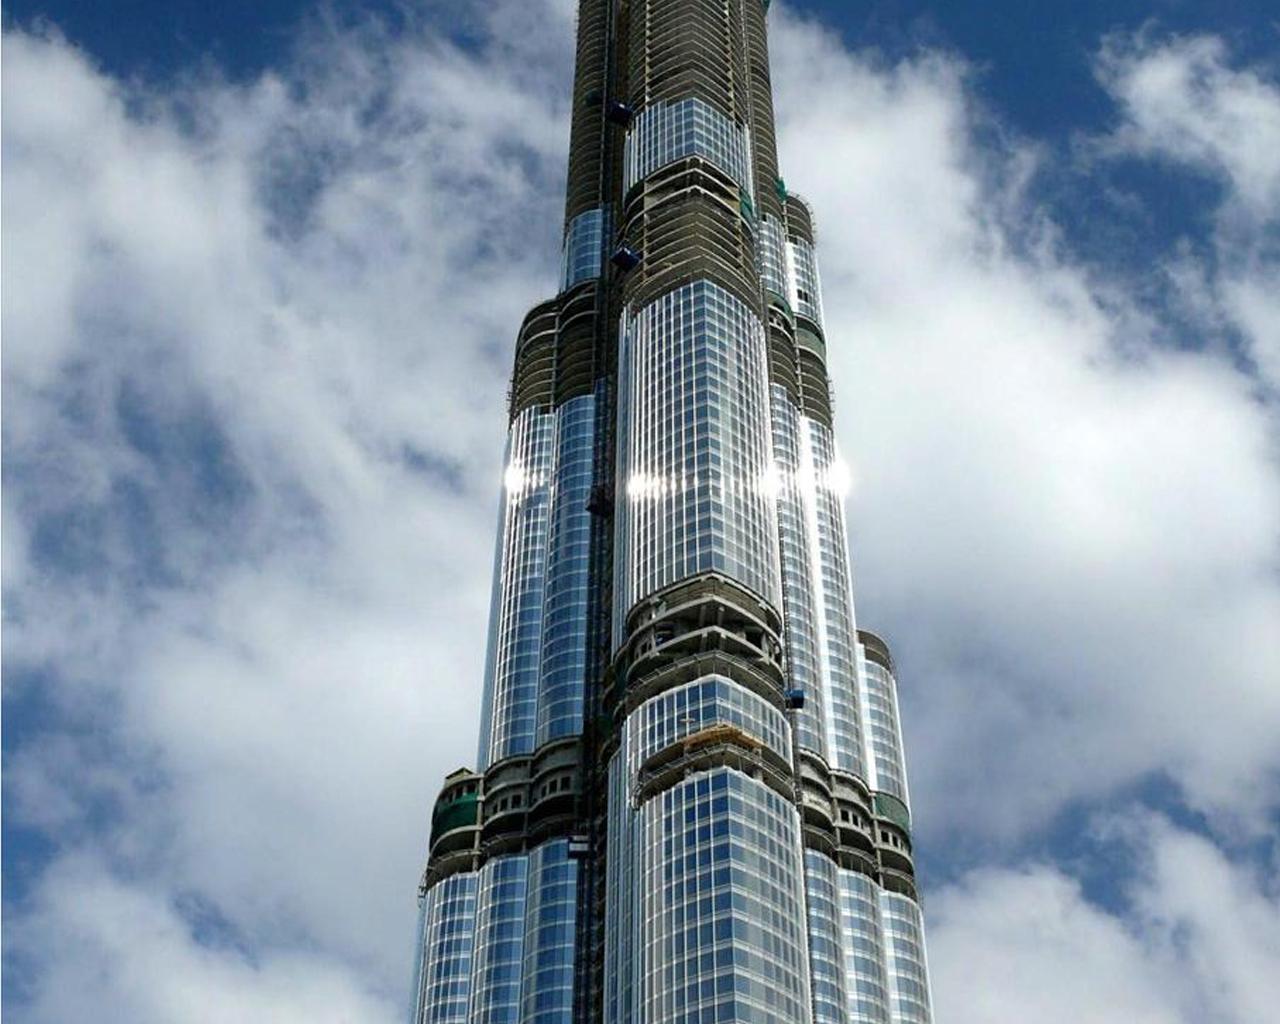 3d Home Wallpaper Malaysia World Beautifull Places All Tower Dubai Nice Image